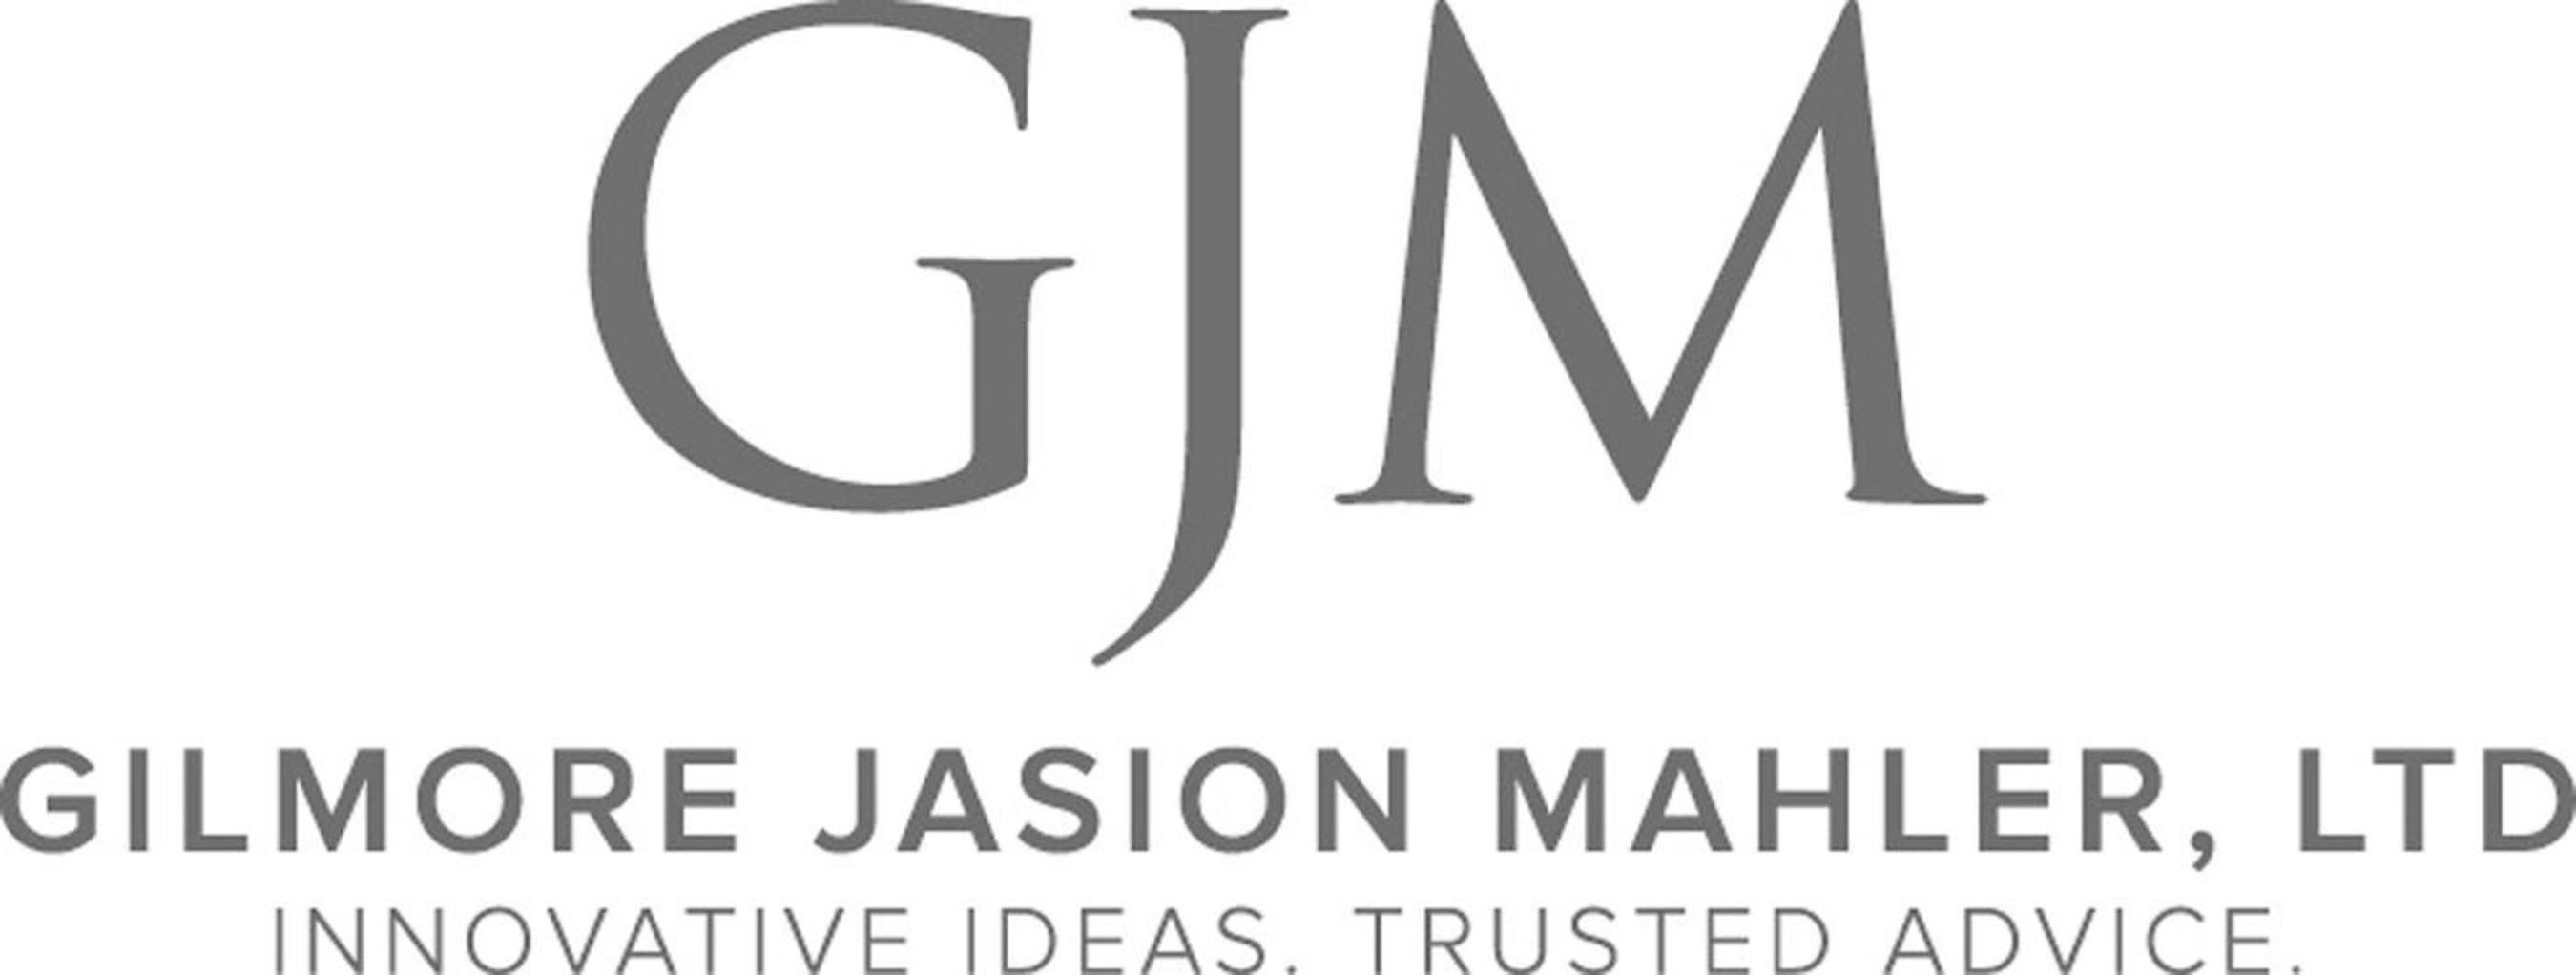 Gilmore Jasion Mahler, LTD....Innovative Ideas, Trusted Advice. (PRNewsFoto/Gilmore, Jasion and Mahler, LTD) (PRNewsFoto/GILMORE, JASION AND MAHLER, LTD)